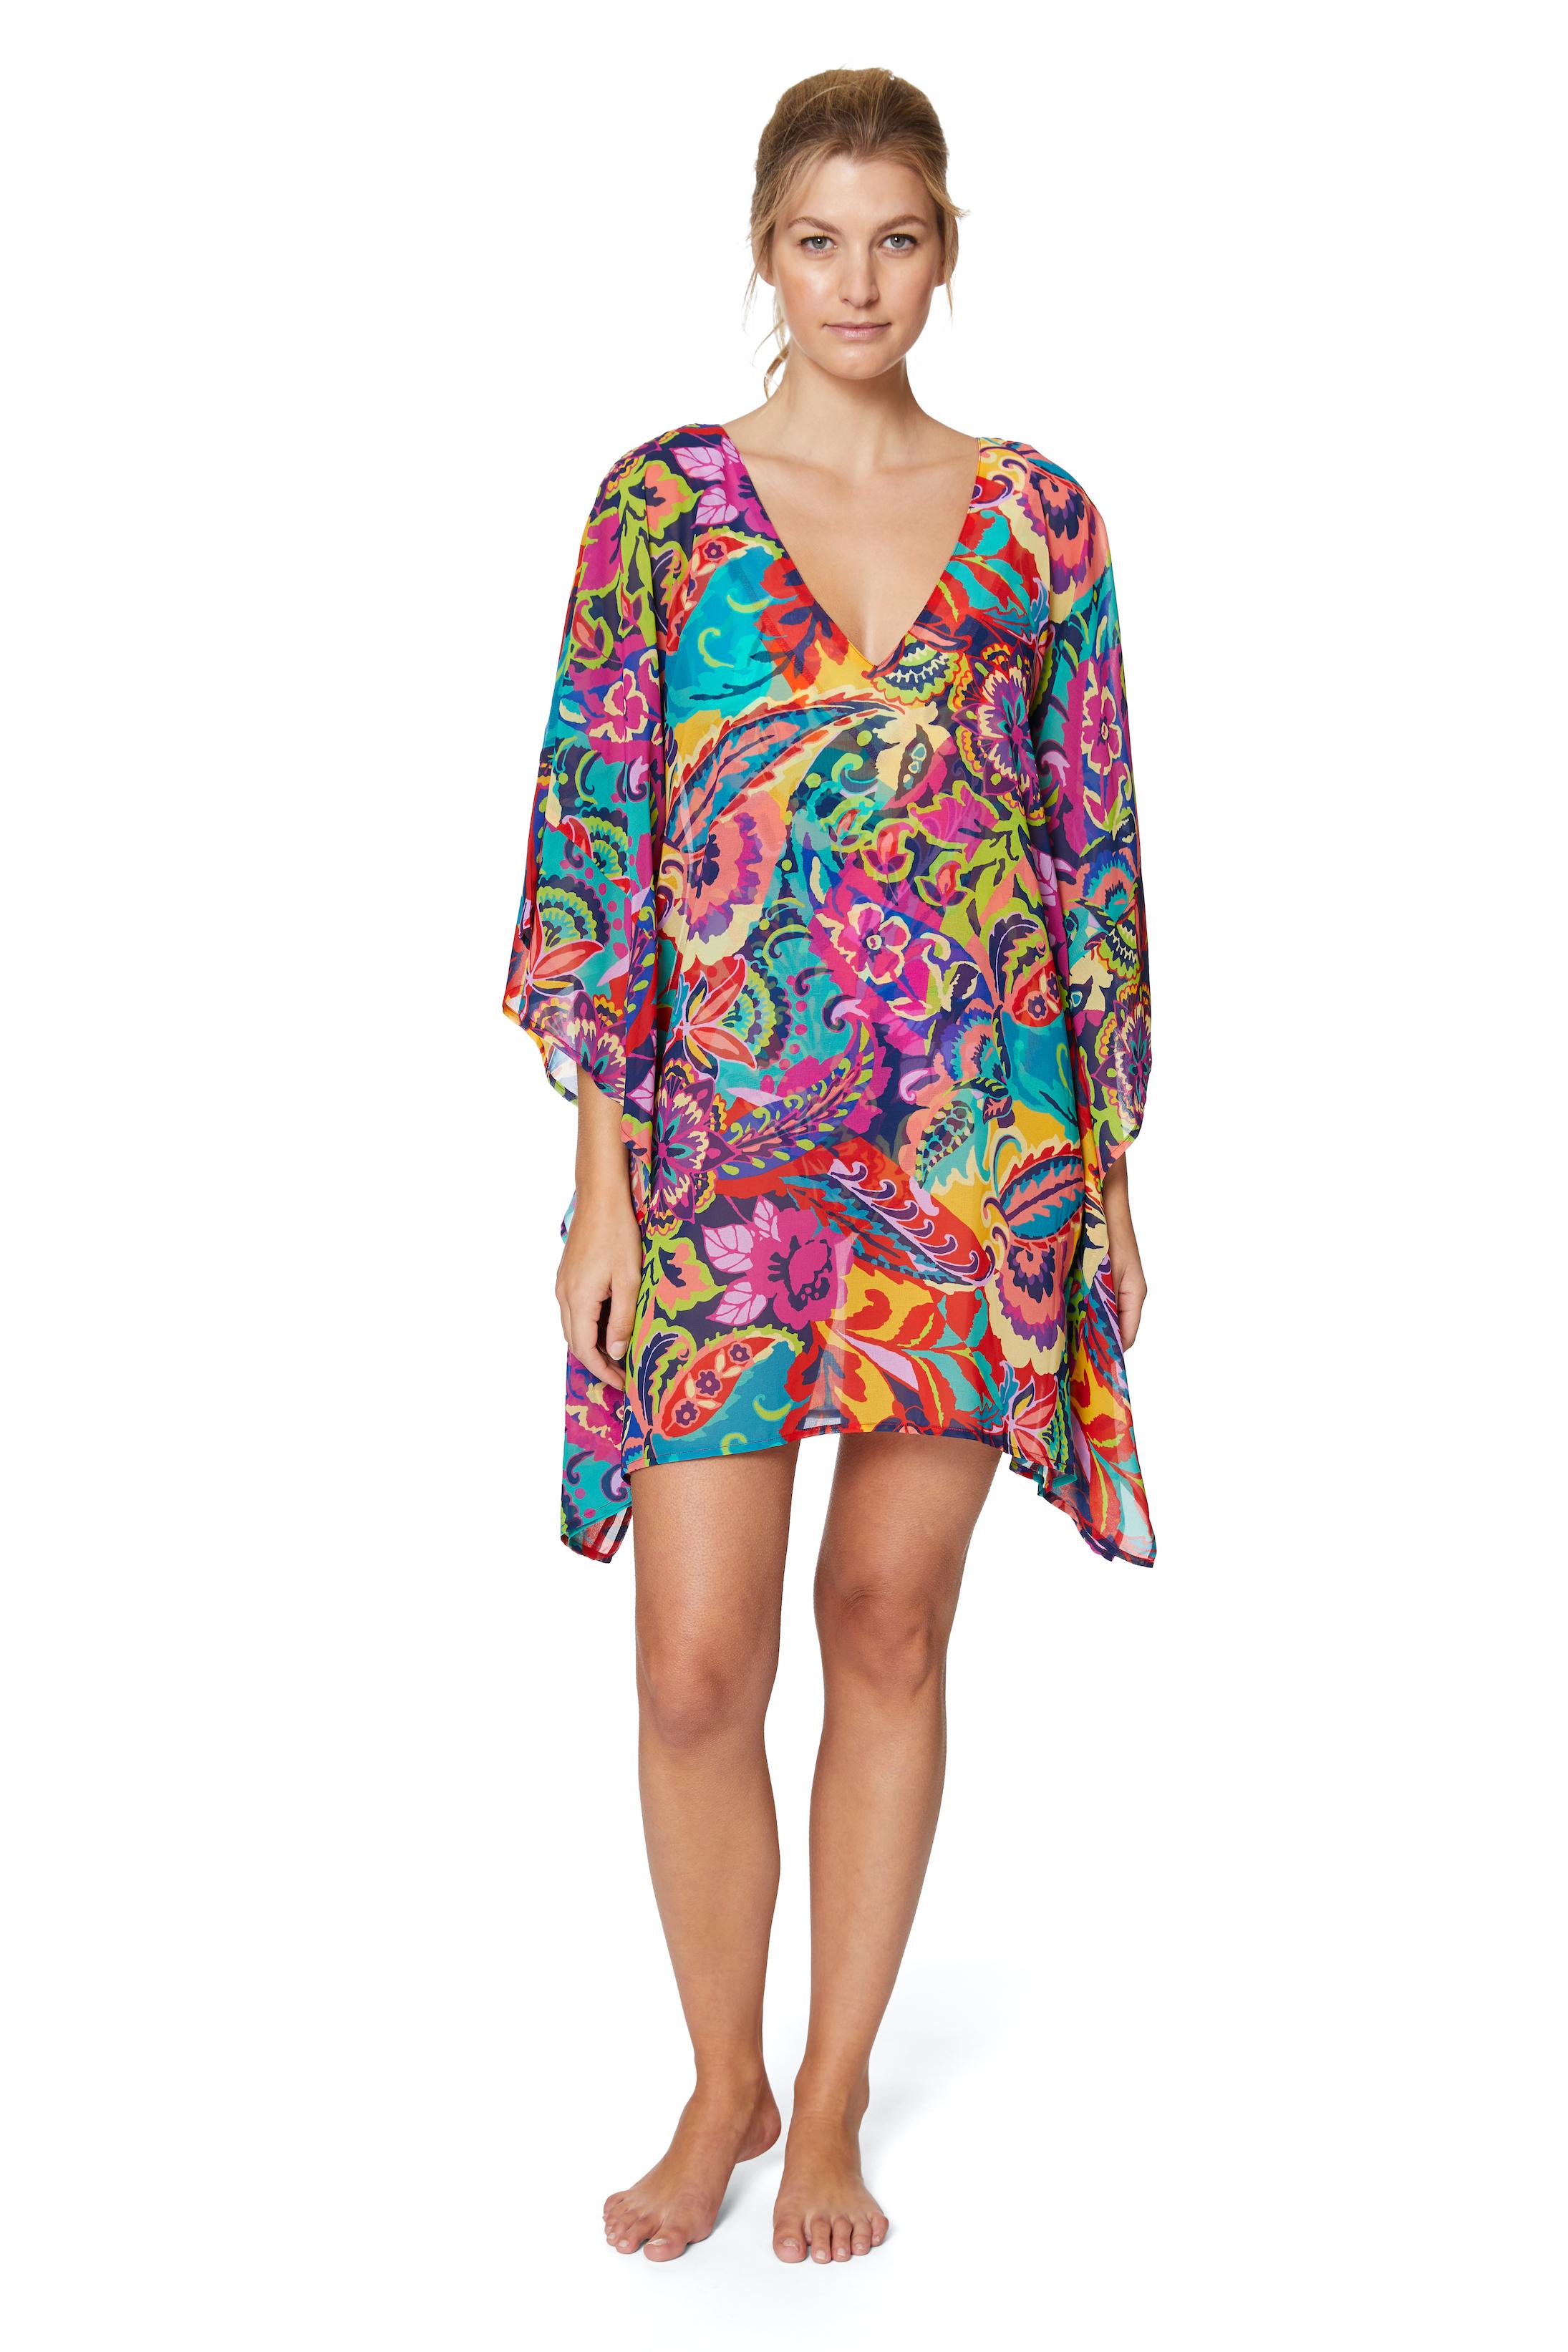 PRE ORDER Tahari® Paris Floral Tunic Swimsuit Cover-Up -Multi - Front